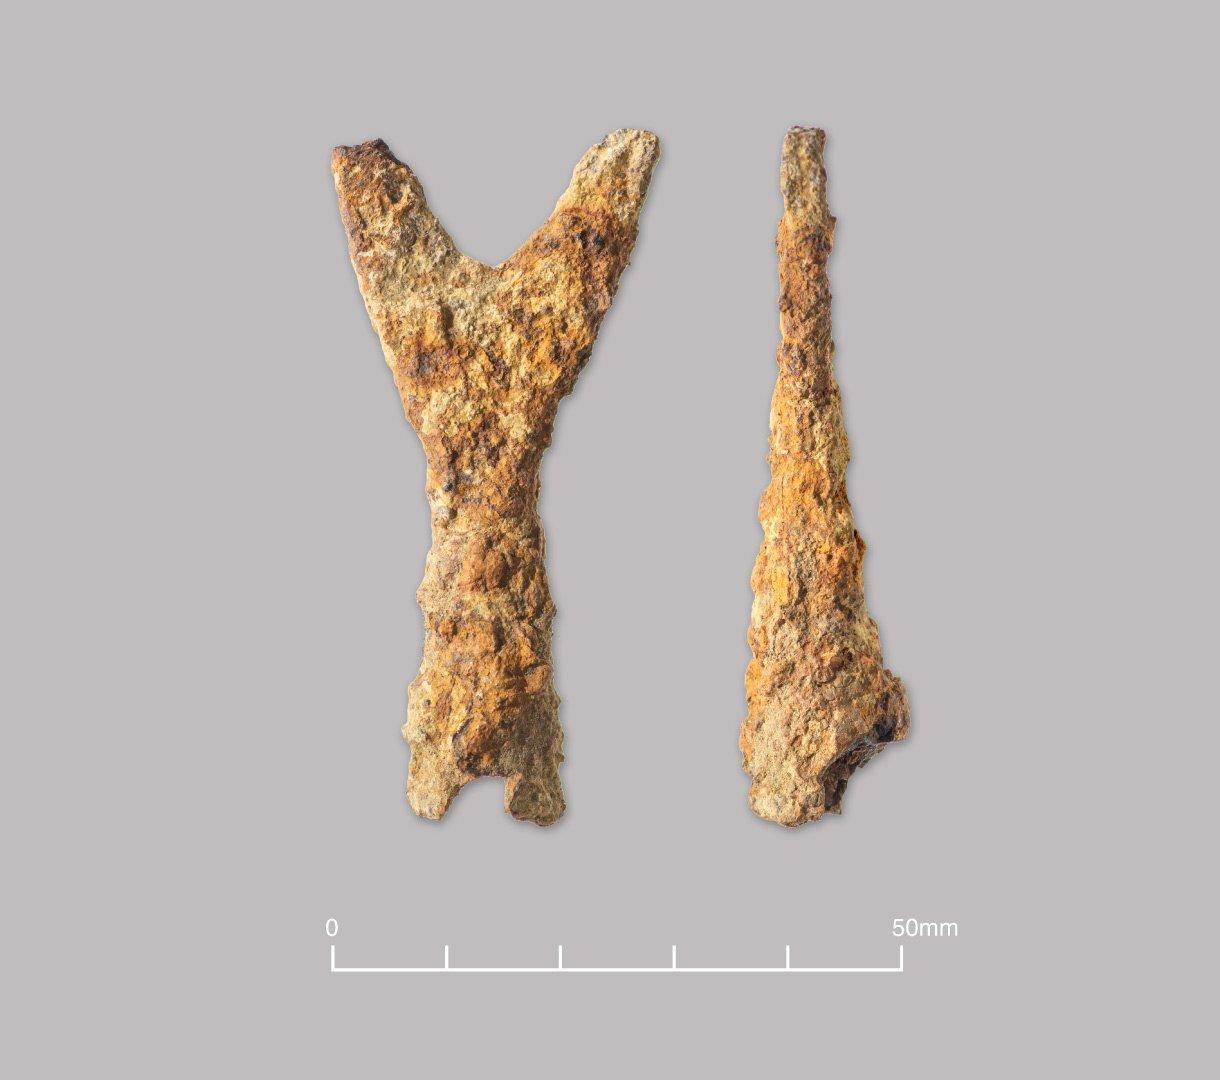 Iron crescent-headed arrowhead. Later Medieval (c. 1300-1500).